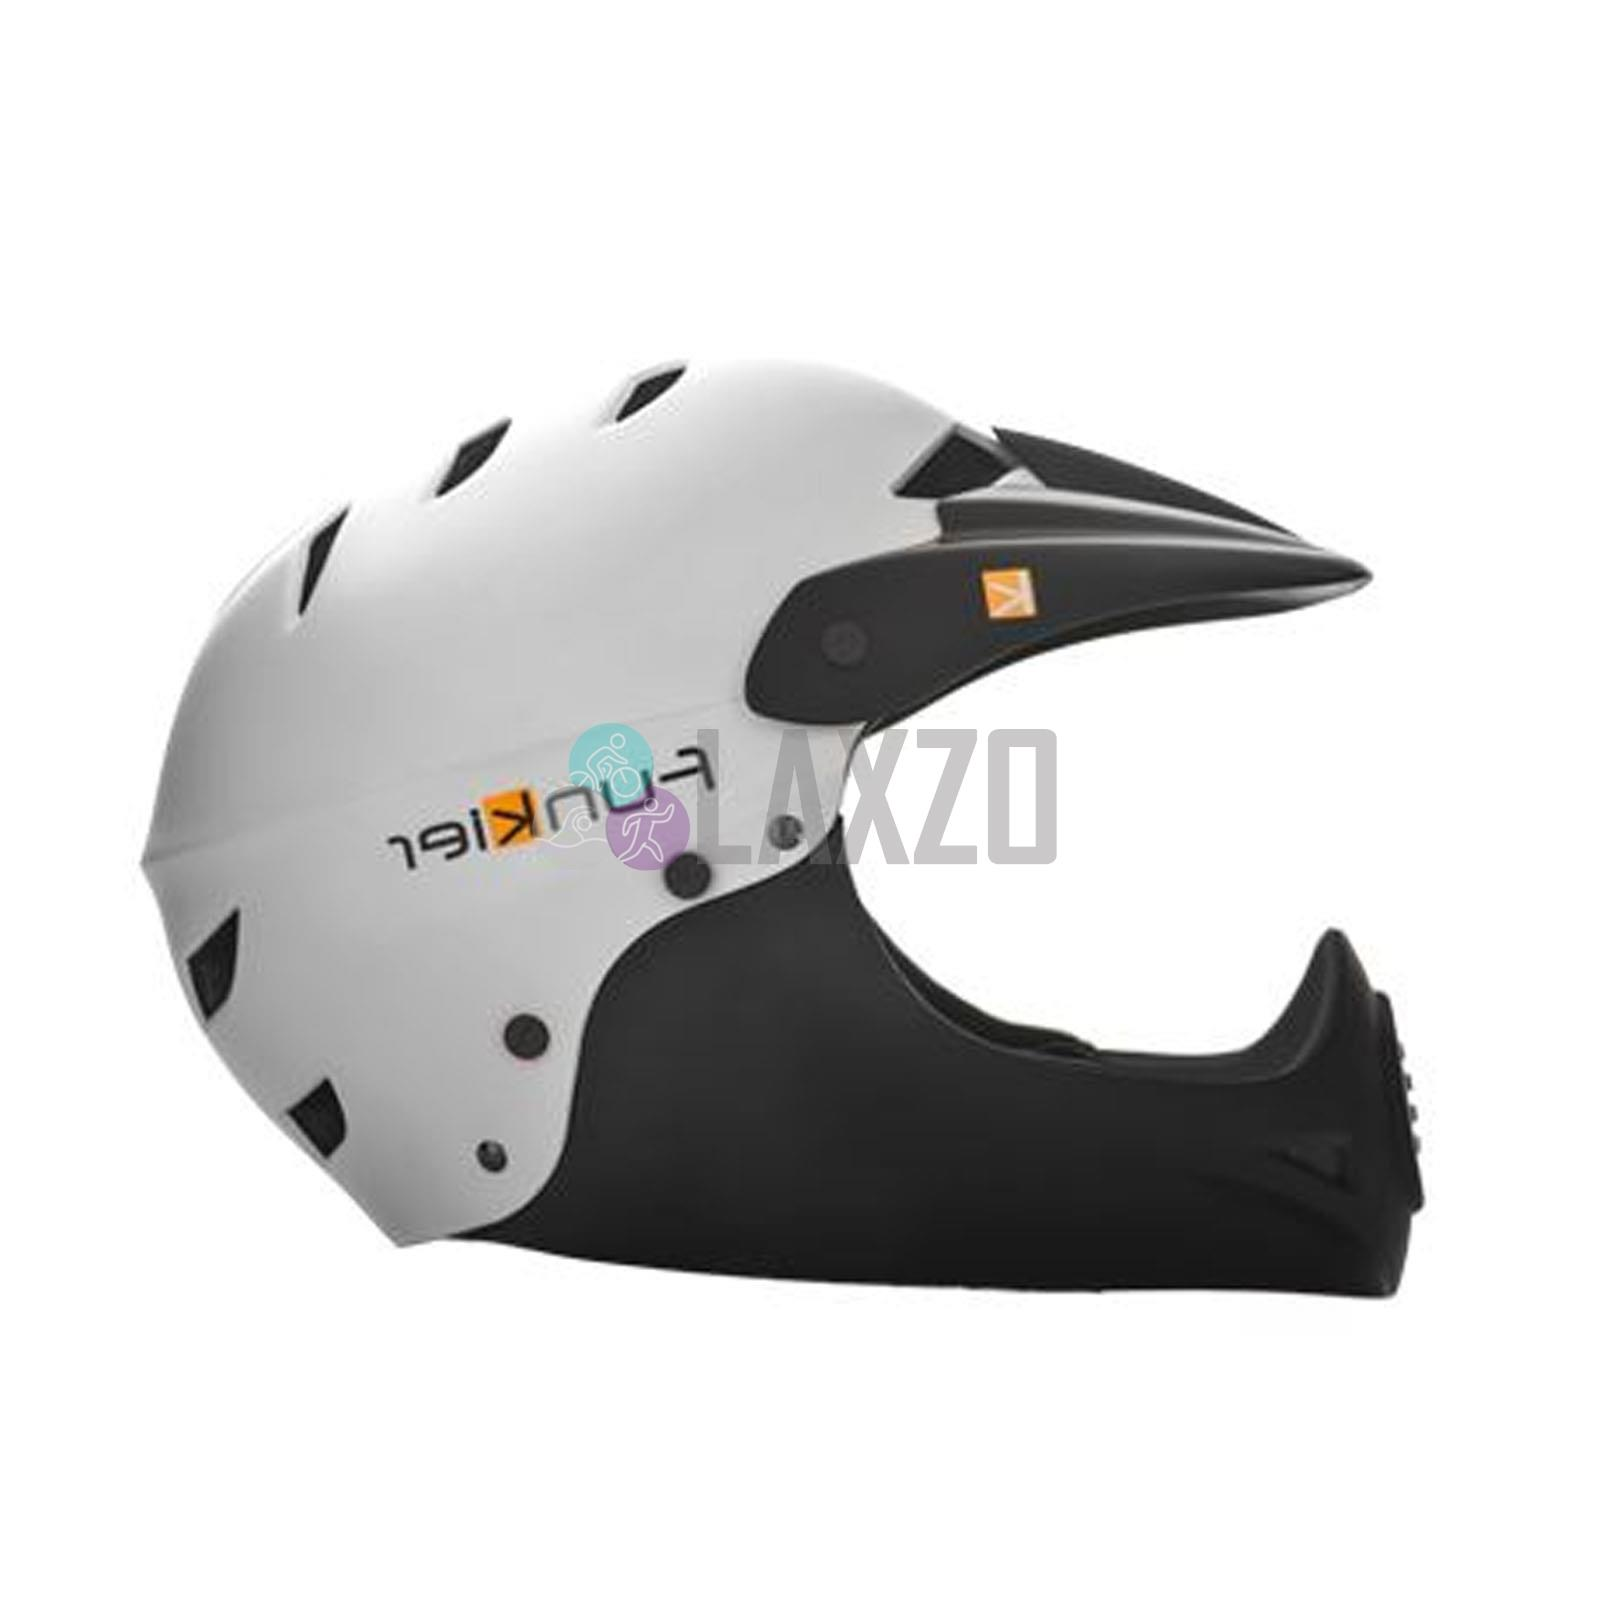 Funkier Tejat Road Elite Helmet in White//Neon